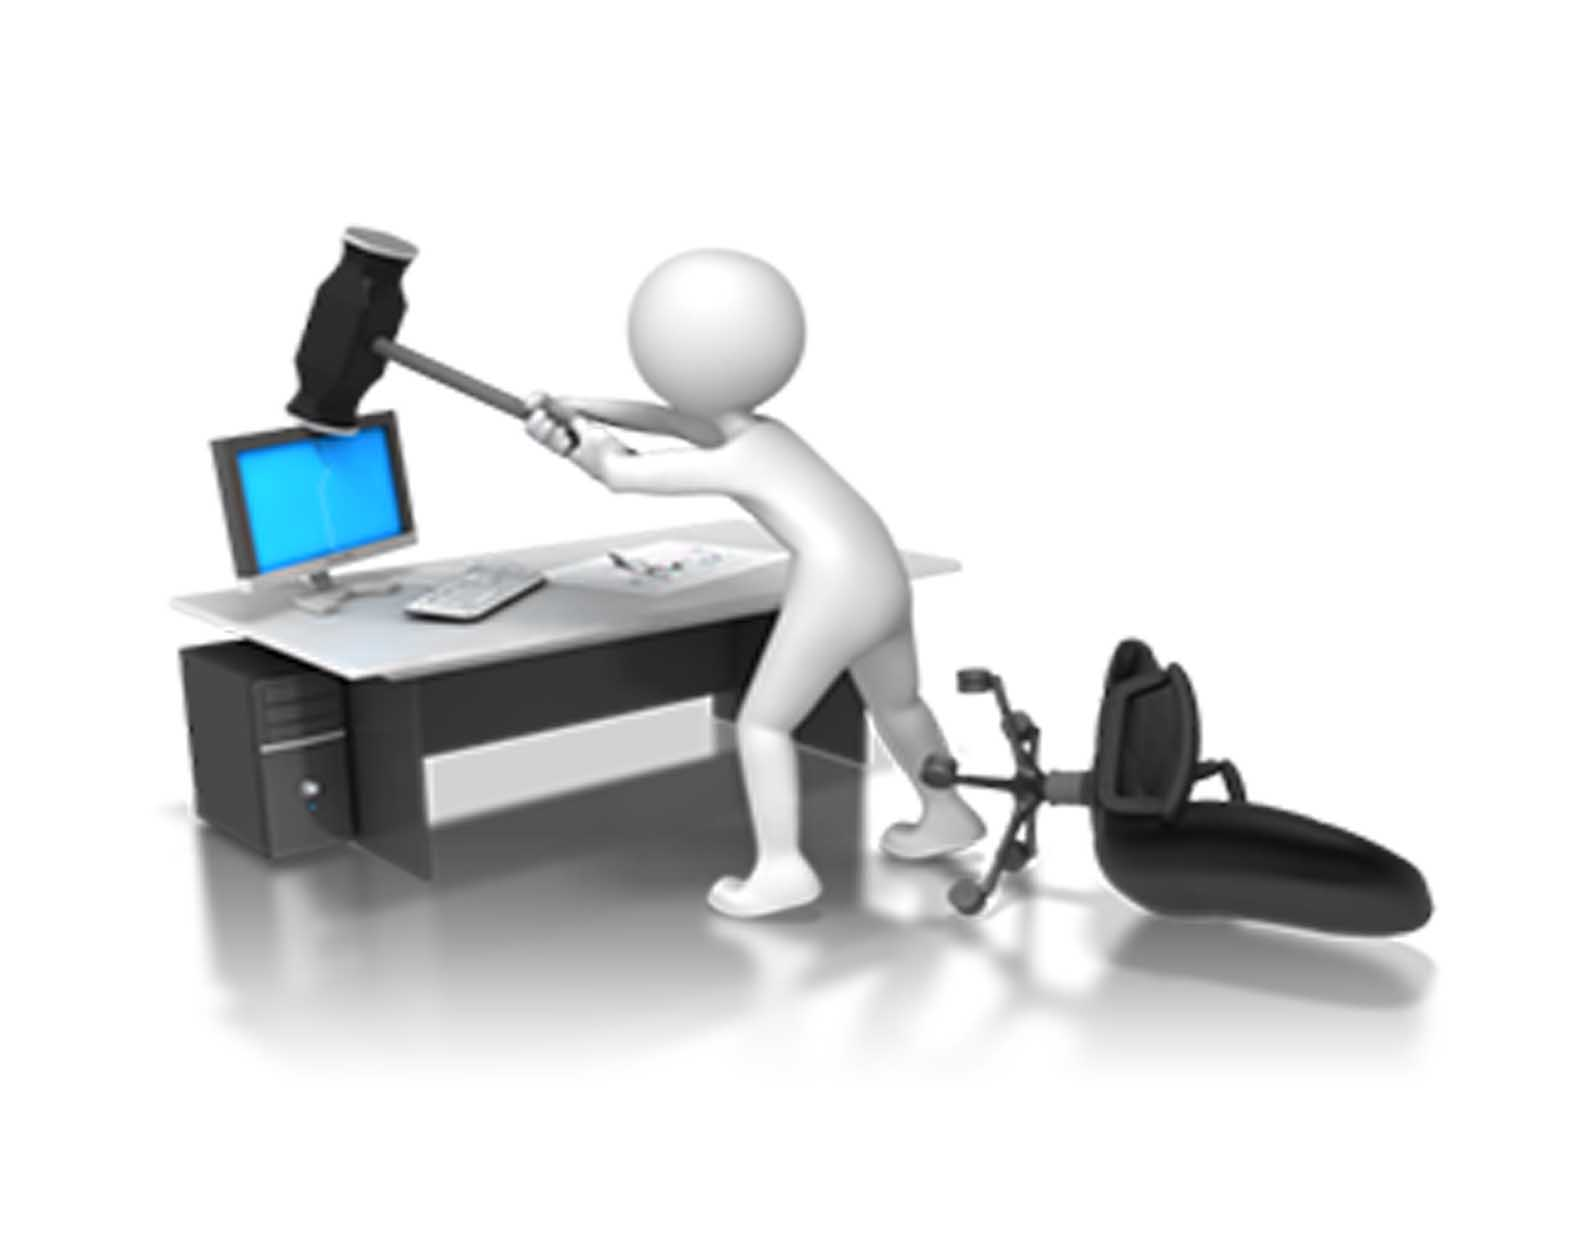 تعویض ویندوز حفظ اطلاعات نرم افزار هلو